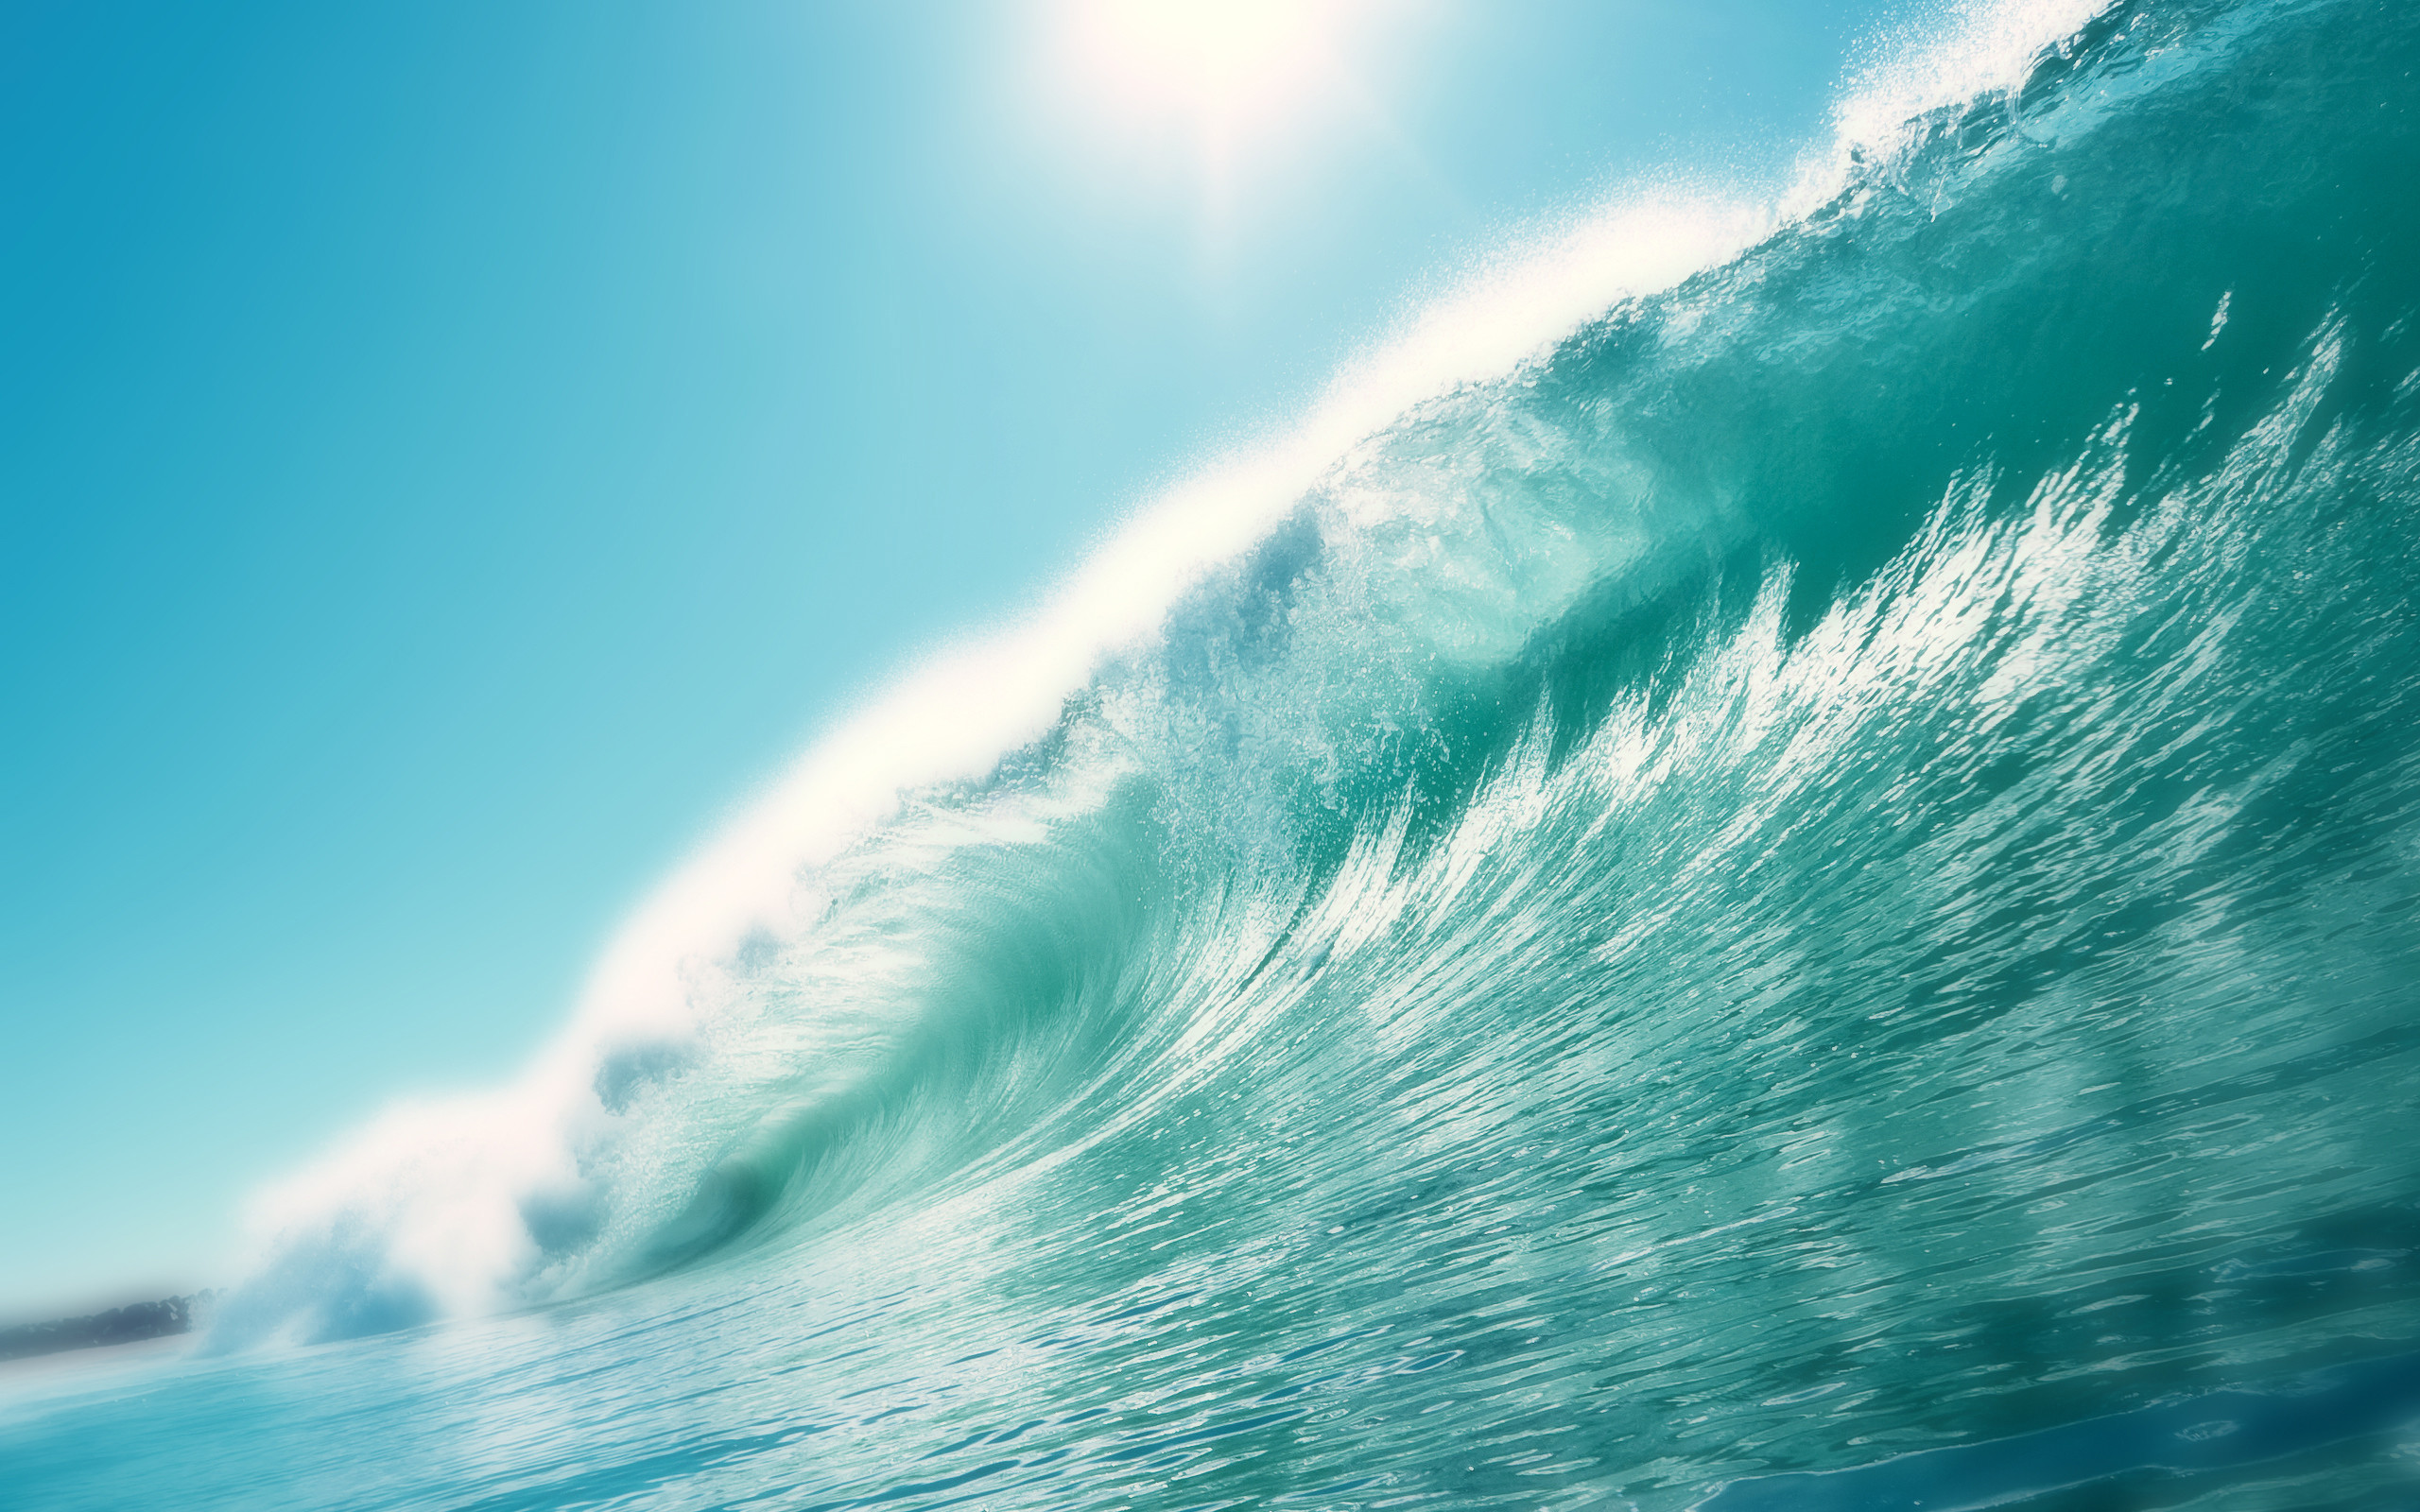 sea-tide-wallpapers-hd-beach-images-beach-hottie-hd-wallpaper